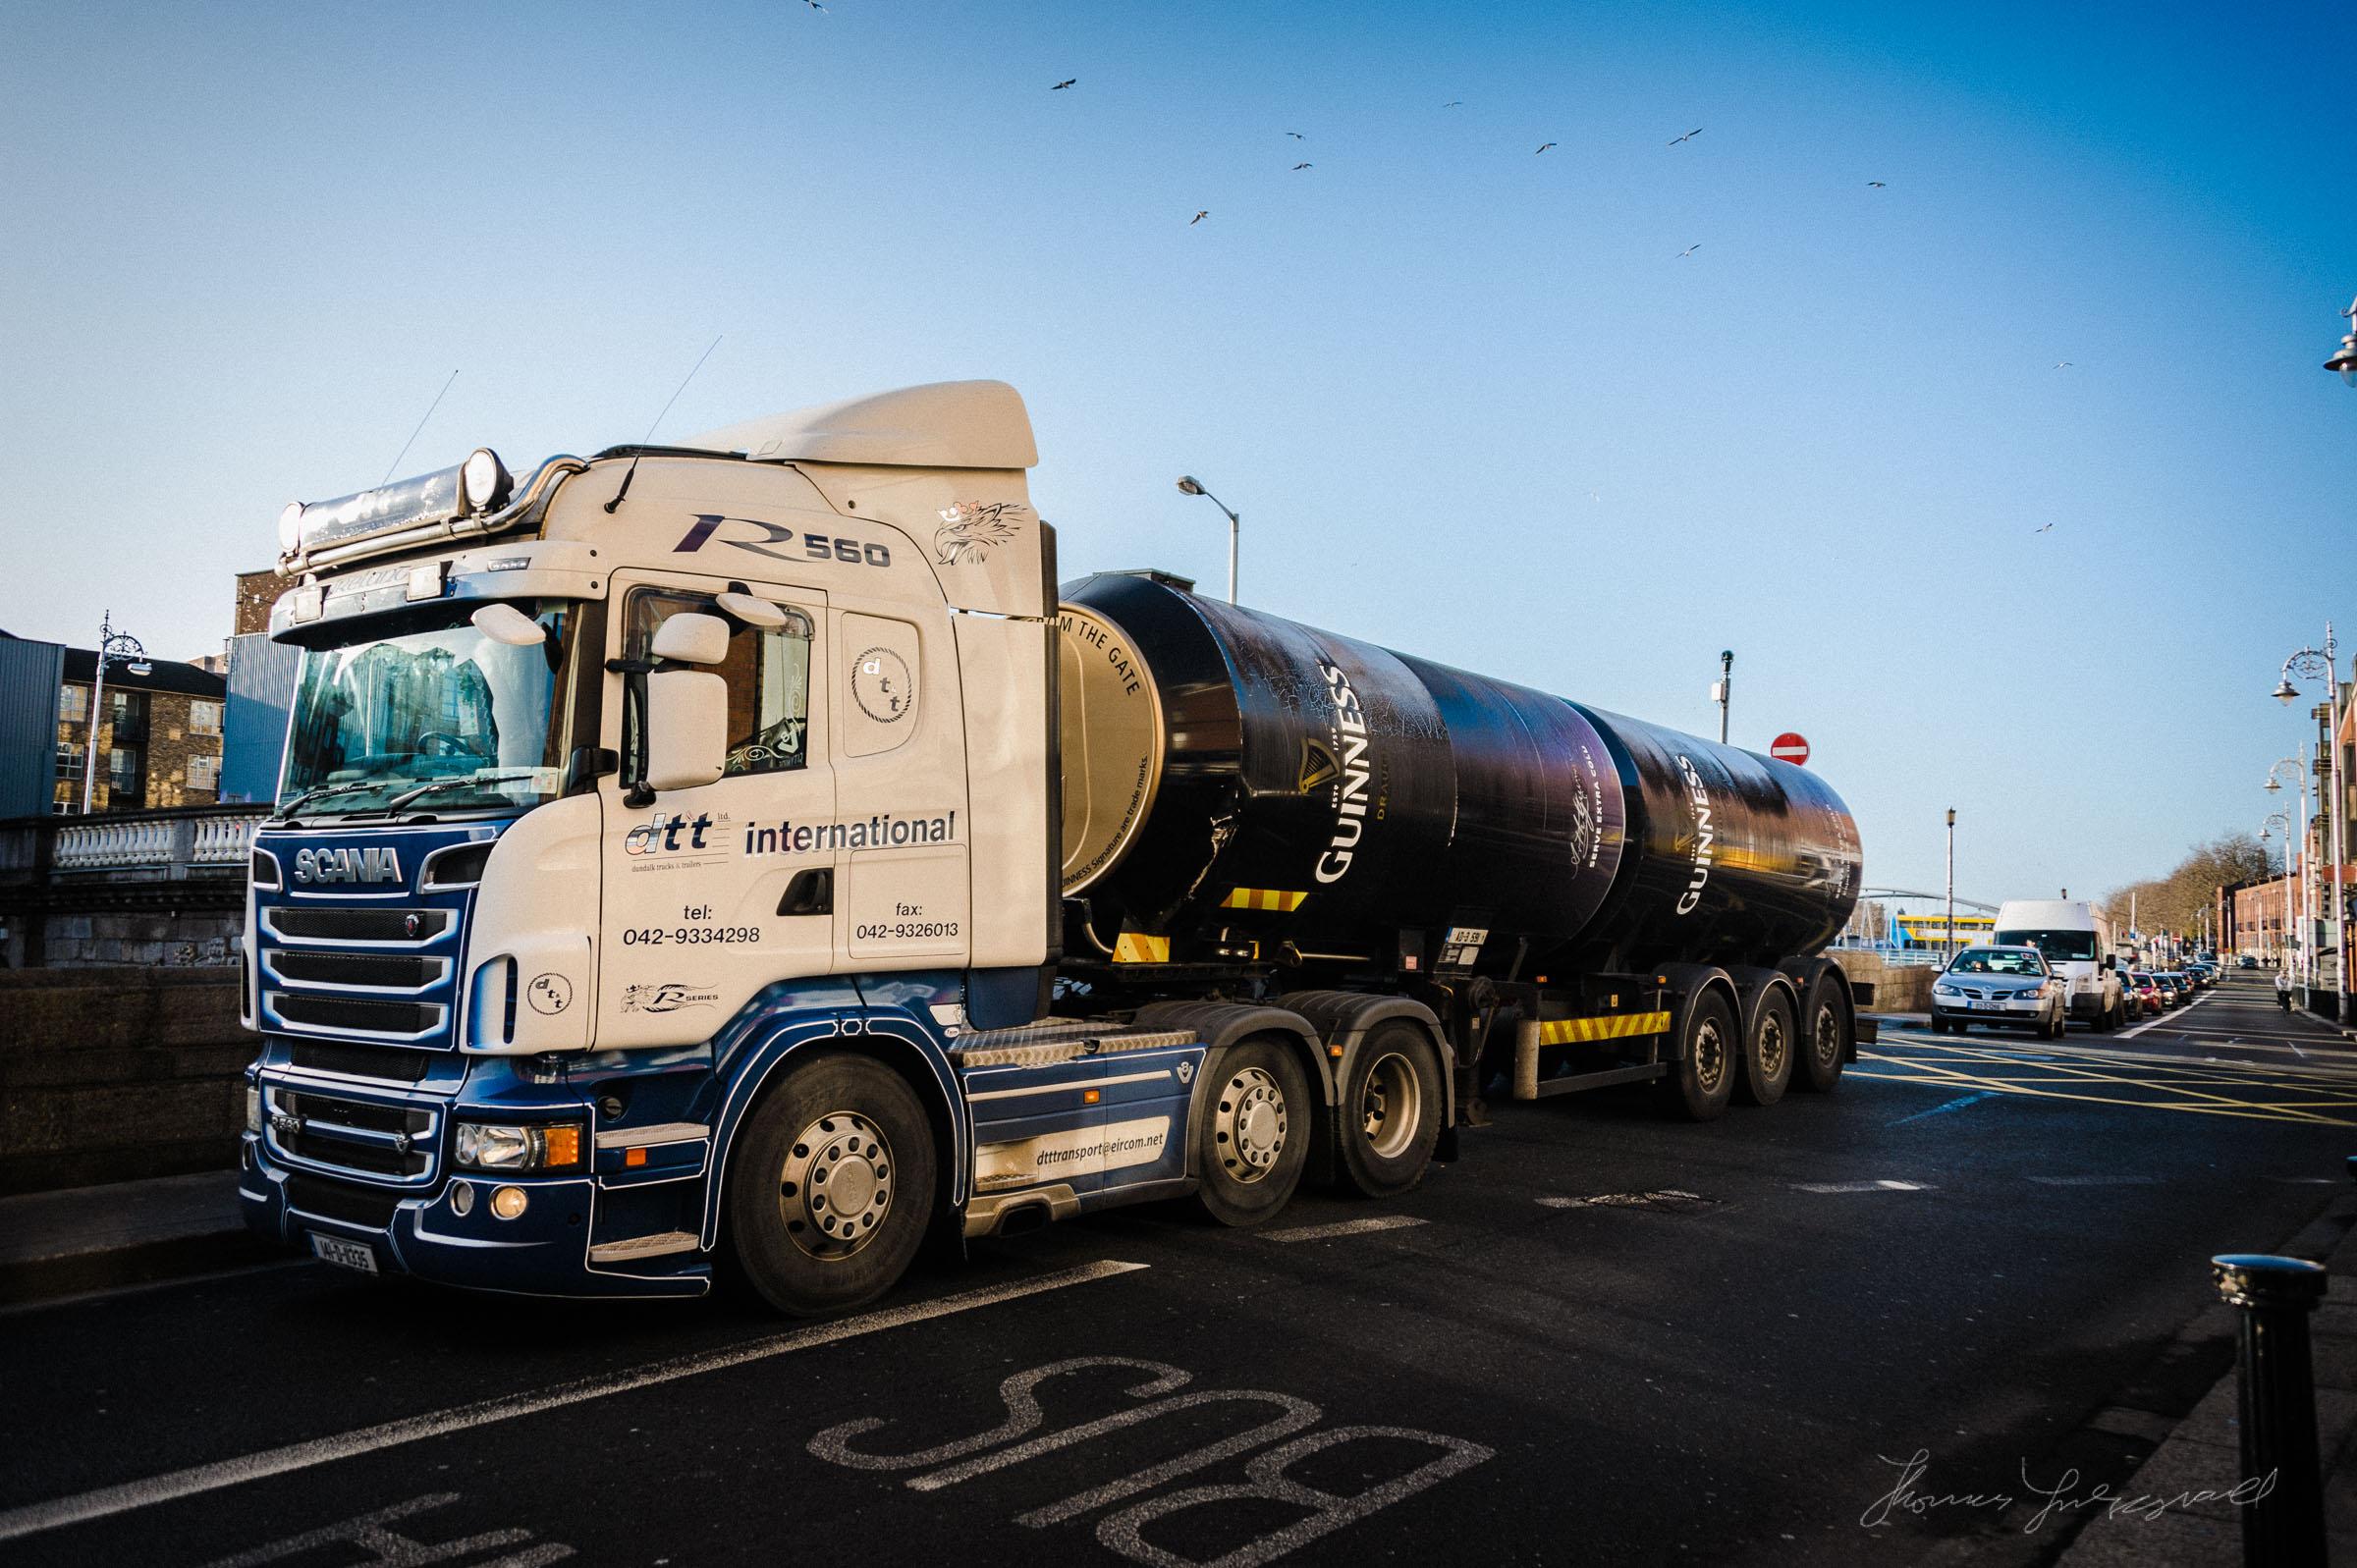 Guinness Truck on the Liffey in Dublin